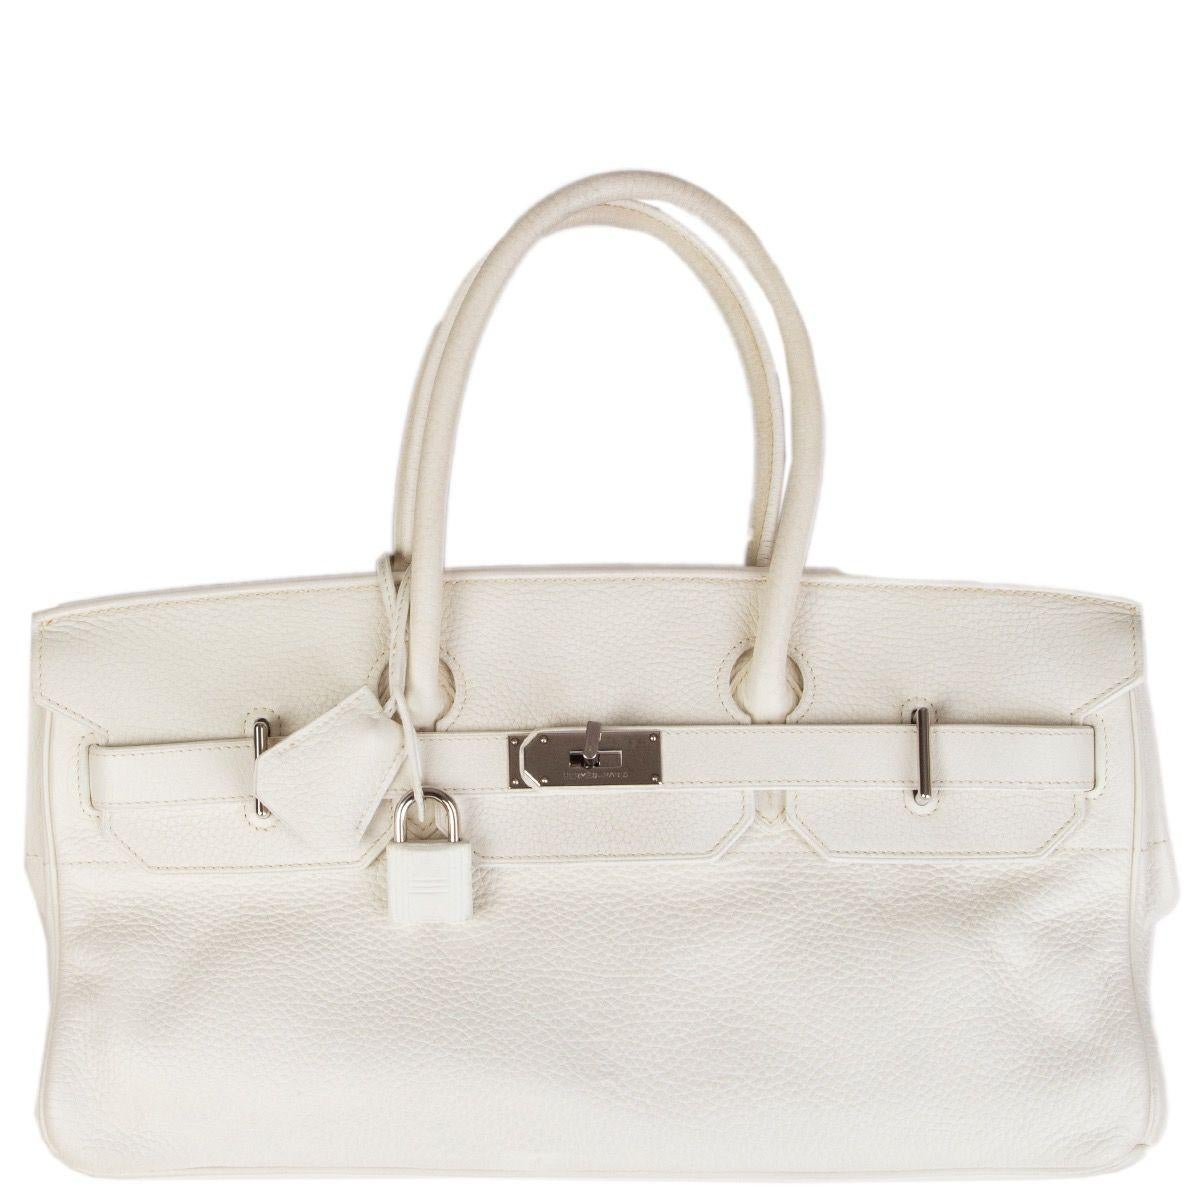 HERMES white Clemence leather & Palladium JPG I SHOULDER BIRKIN Bag